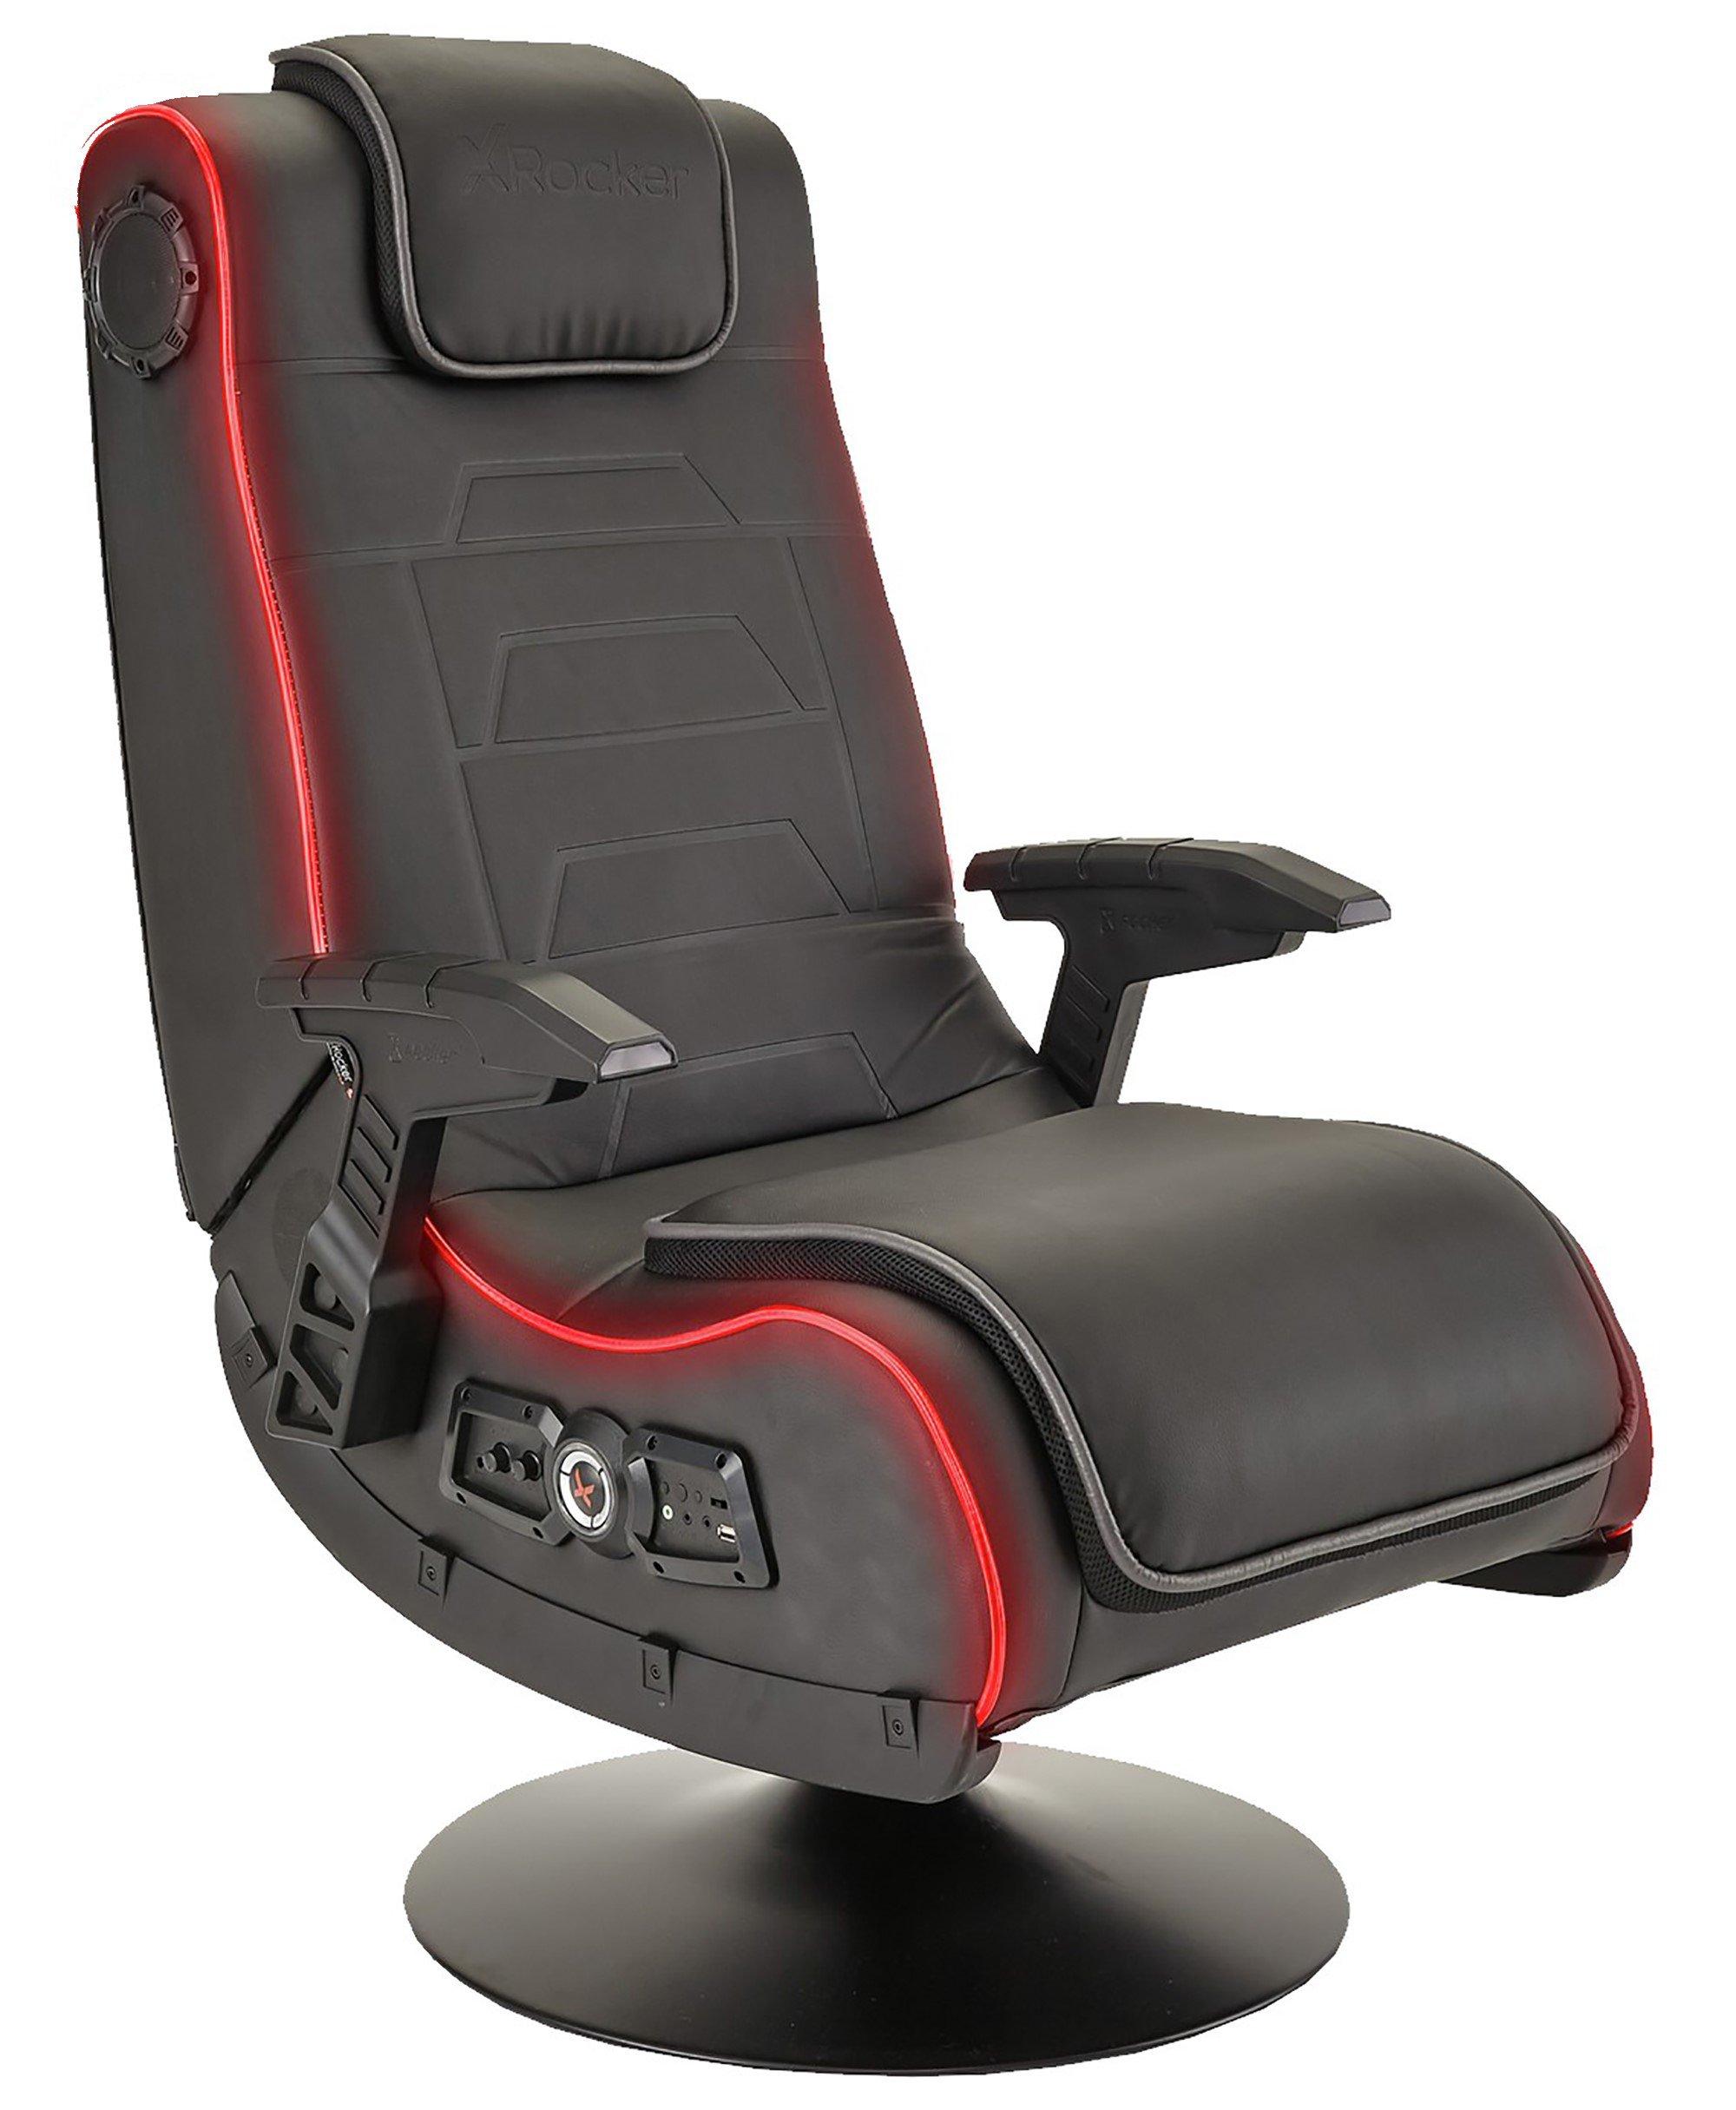 X Rocker New Evo Pro Gaming Chair